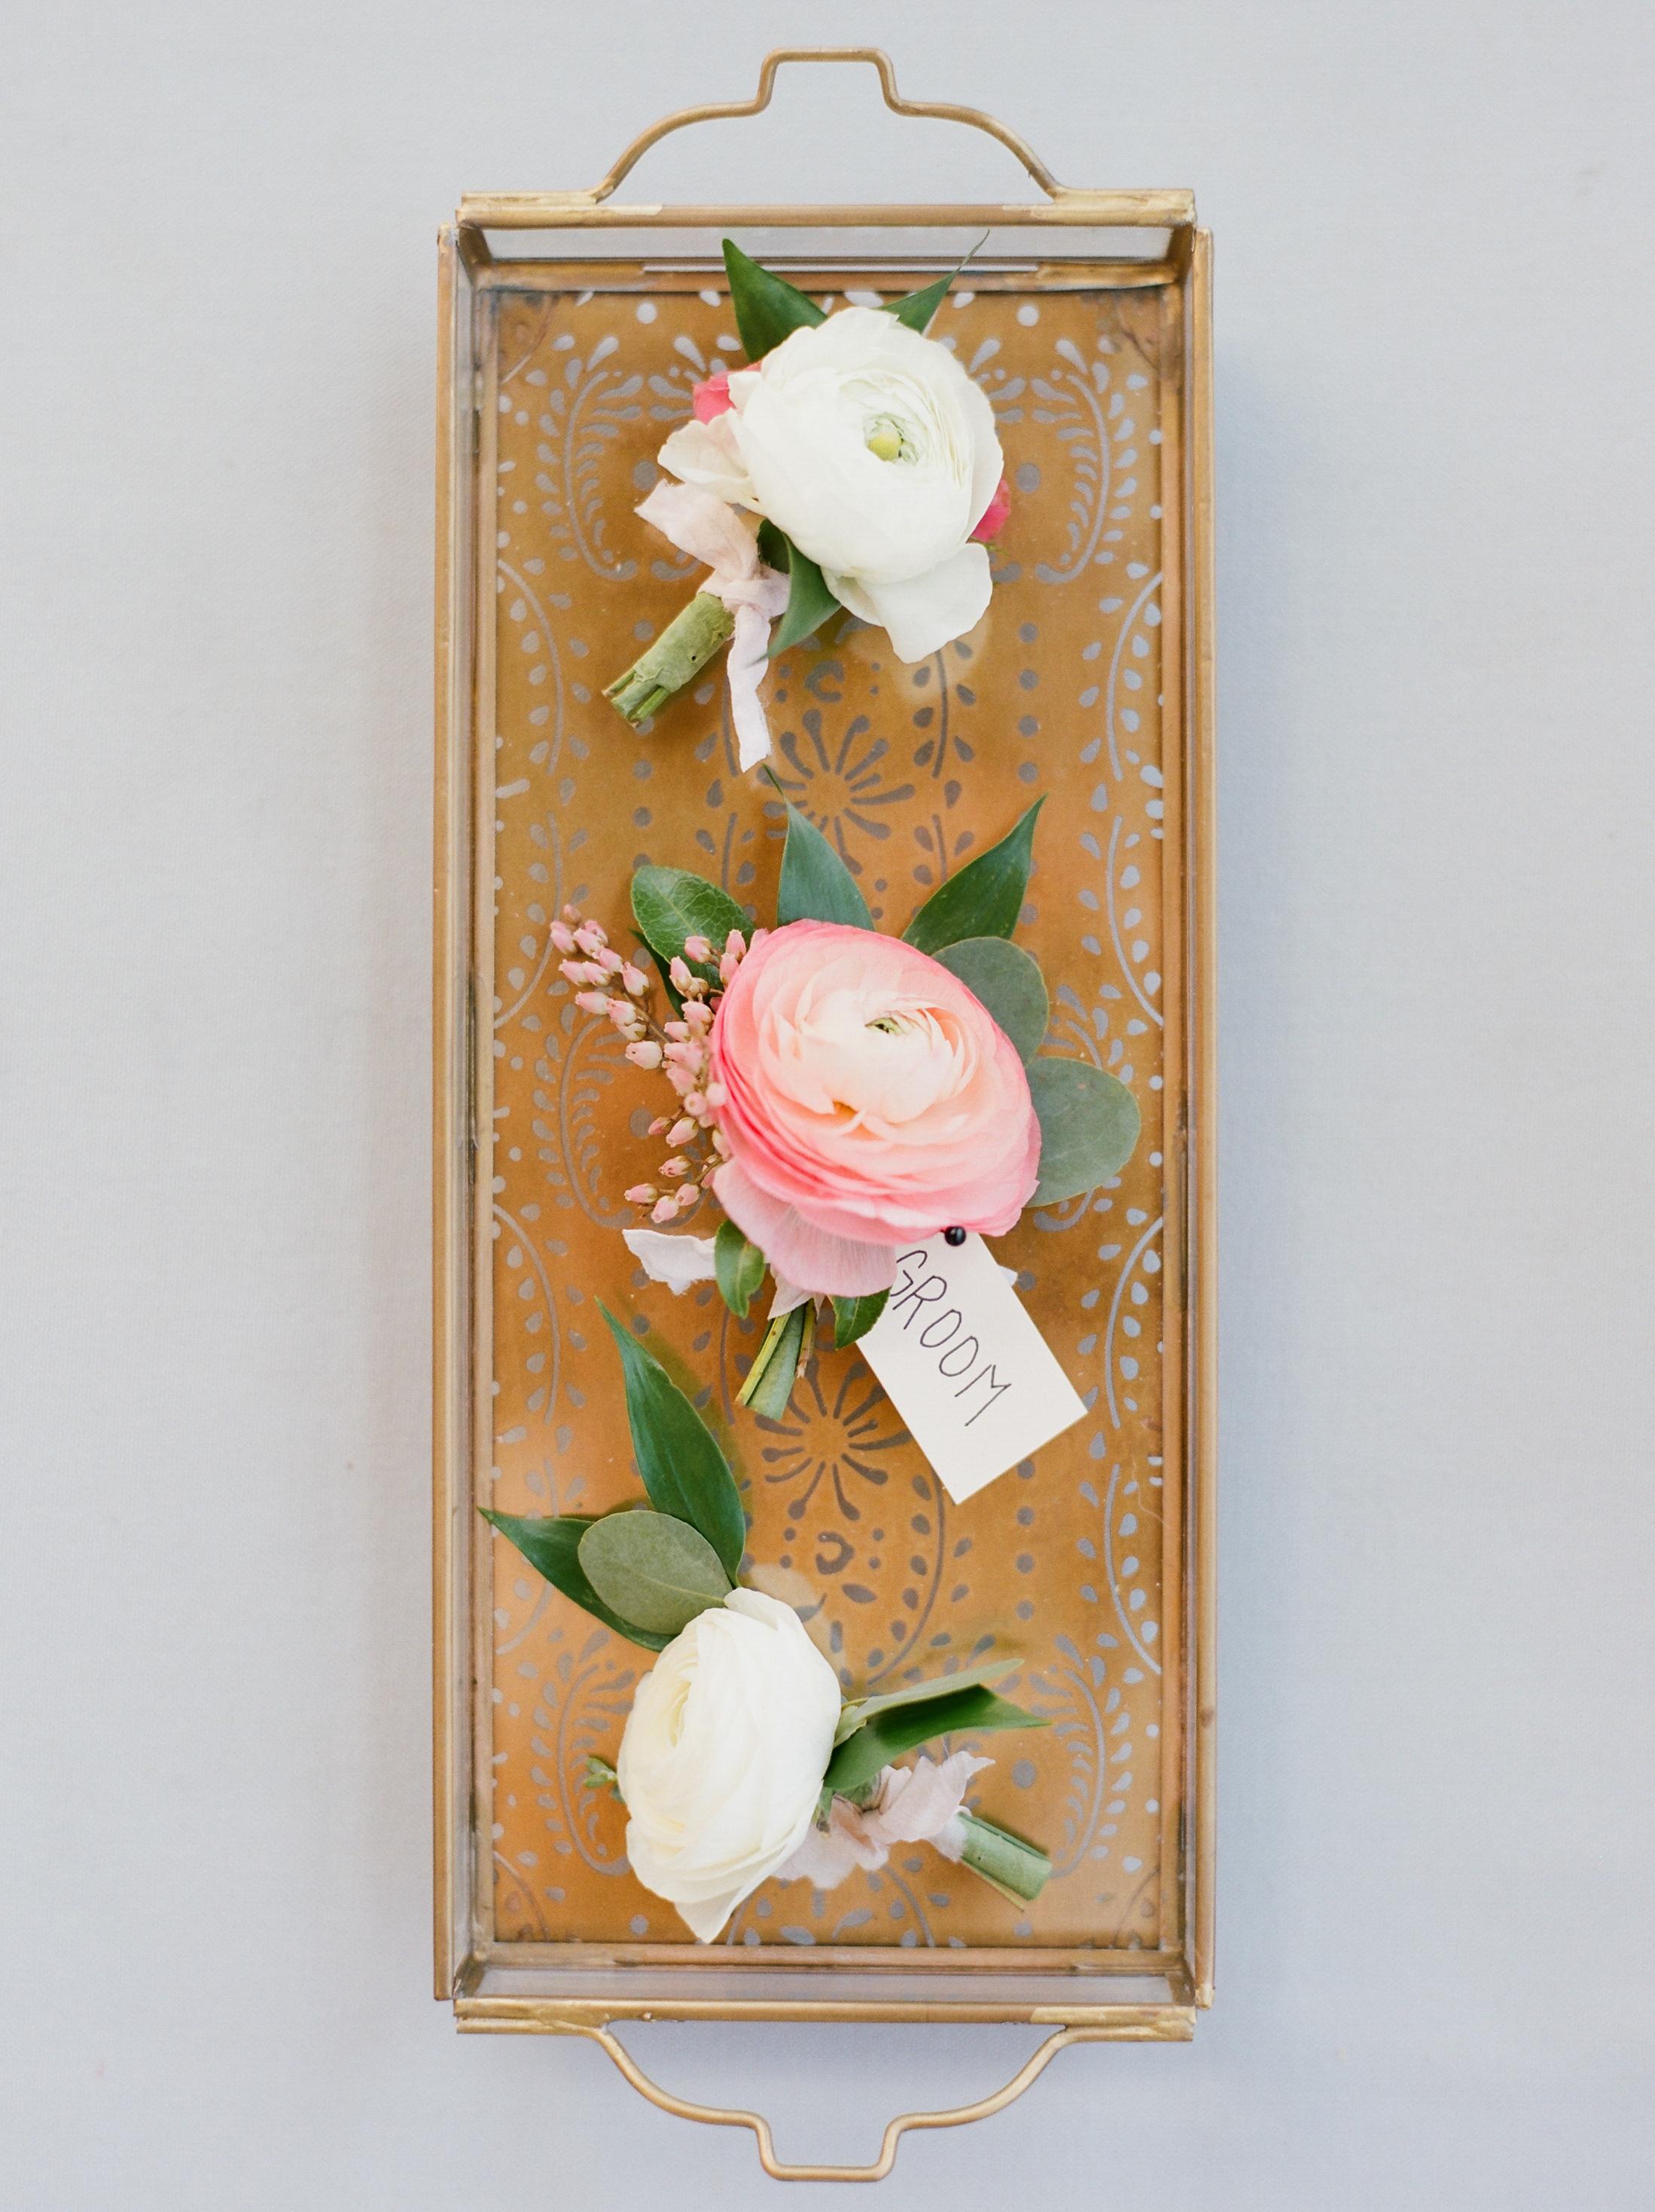 The-Knot-50-Weddings-50-States-Texas-Winner-Dana-Fernandez-photography-houston-wedding-photographer-film-fine-art-destination-19.jpg